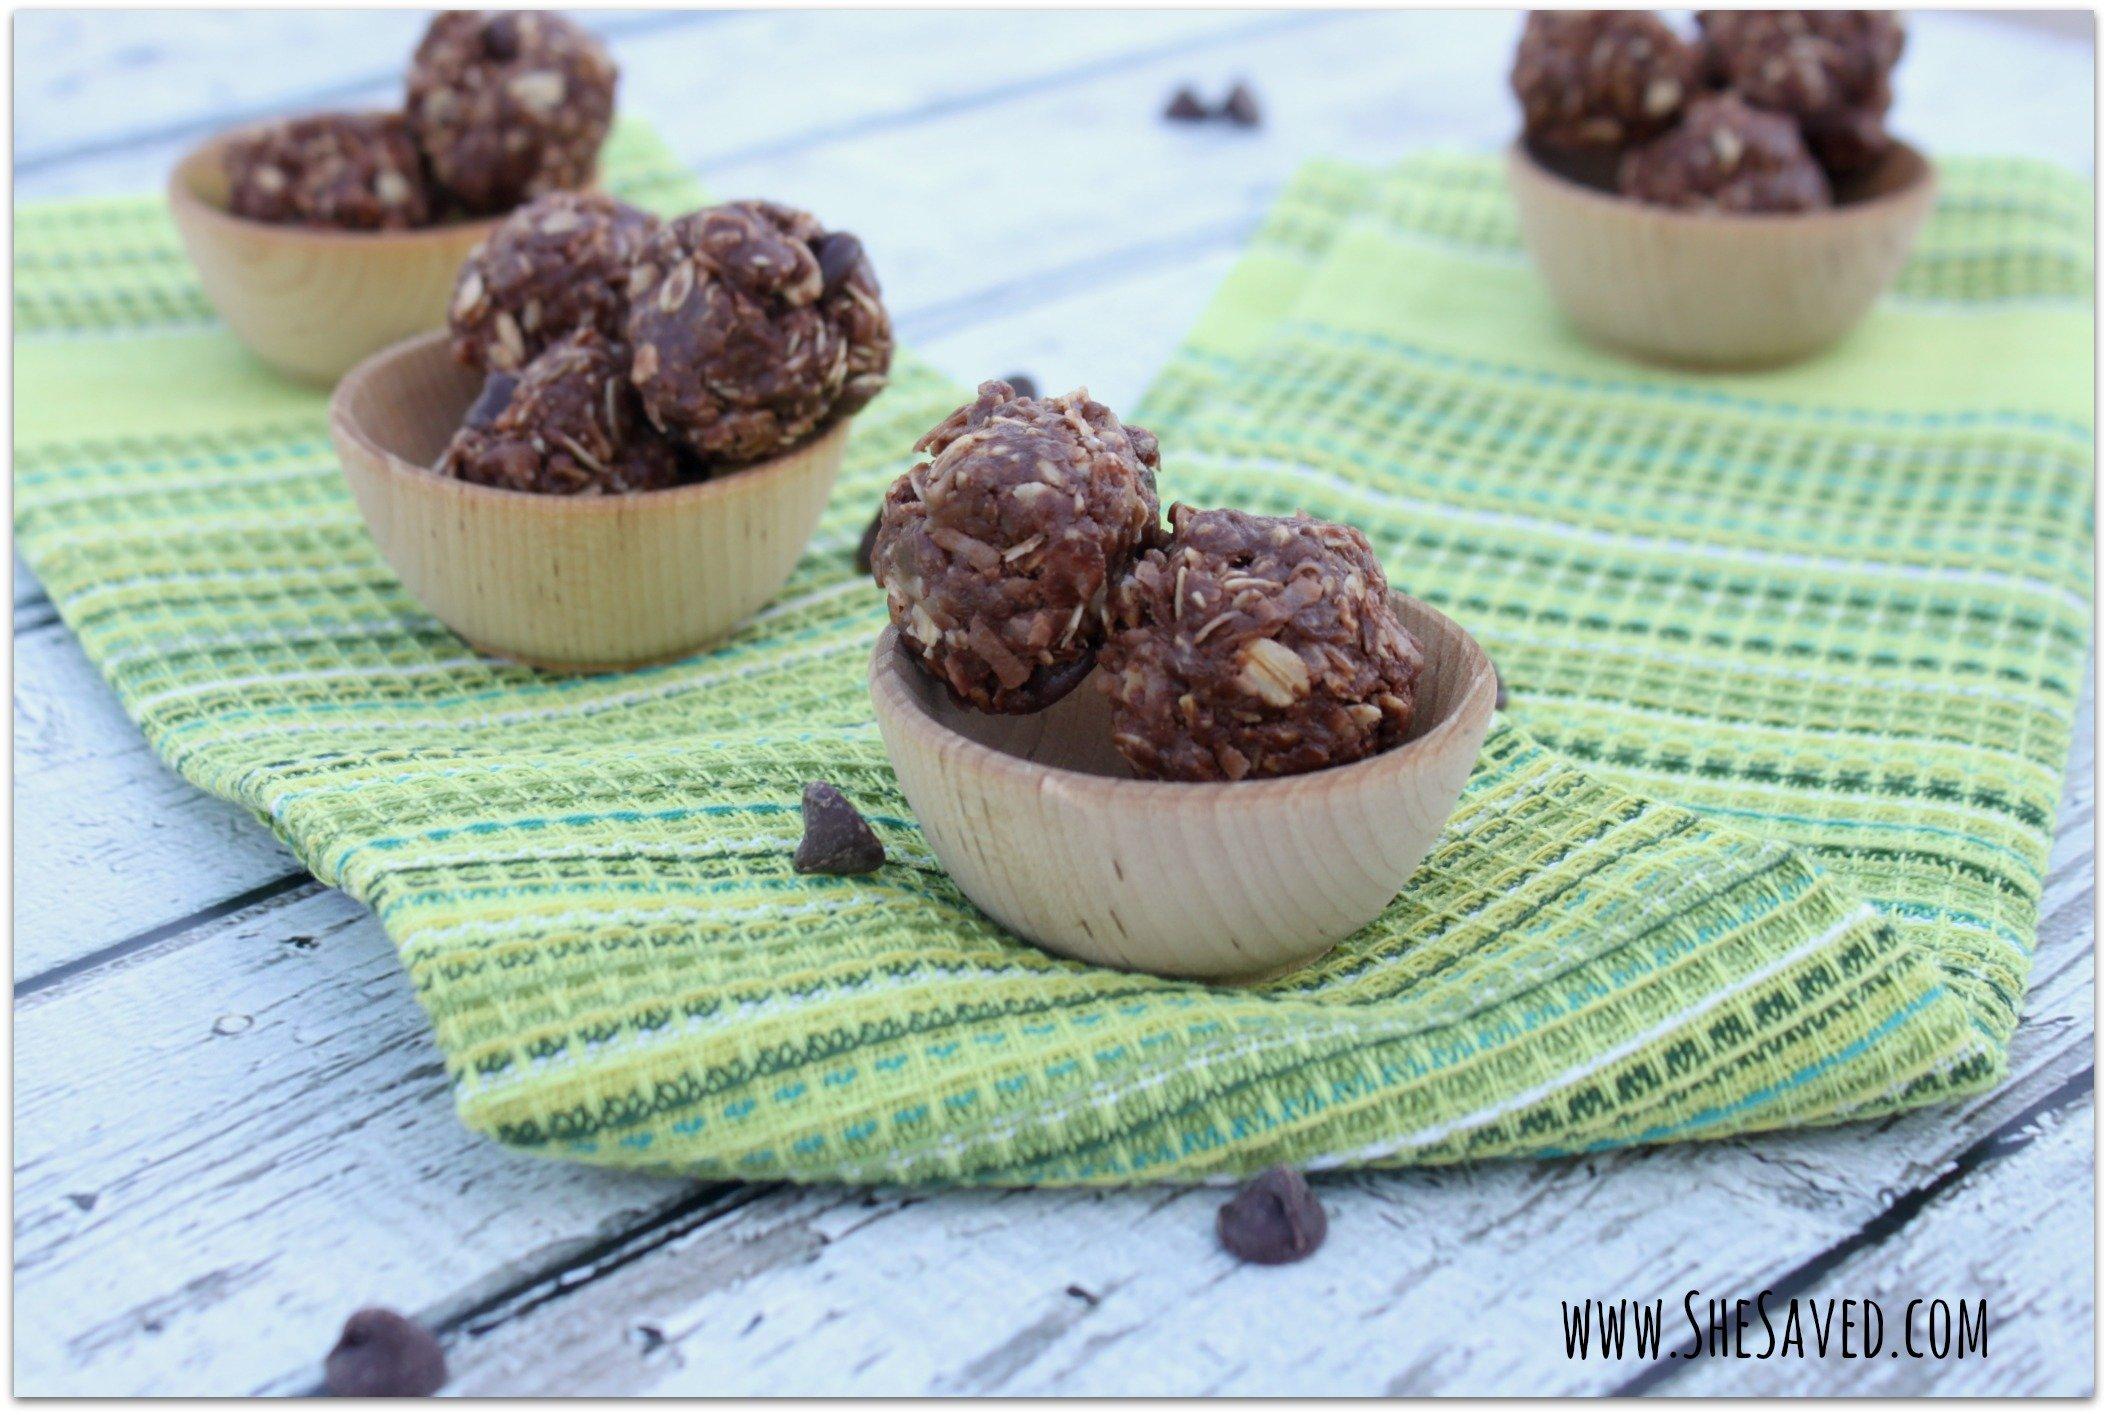 Chocolate Peanut Butter No-Bake Energy Balls Recipe